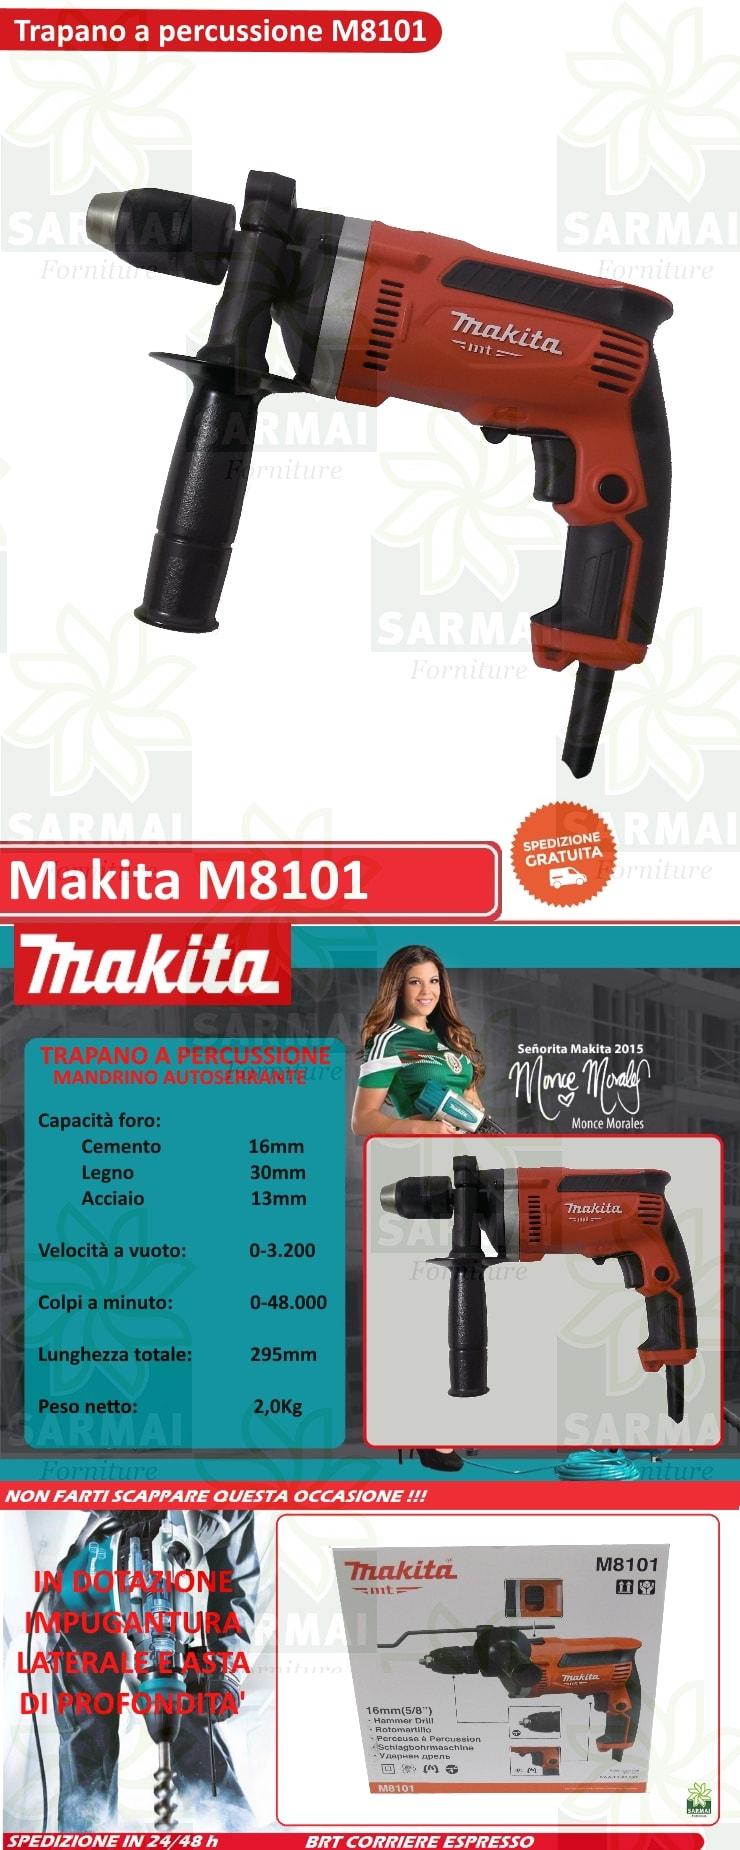 M8101